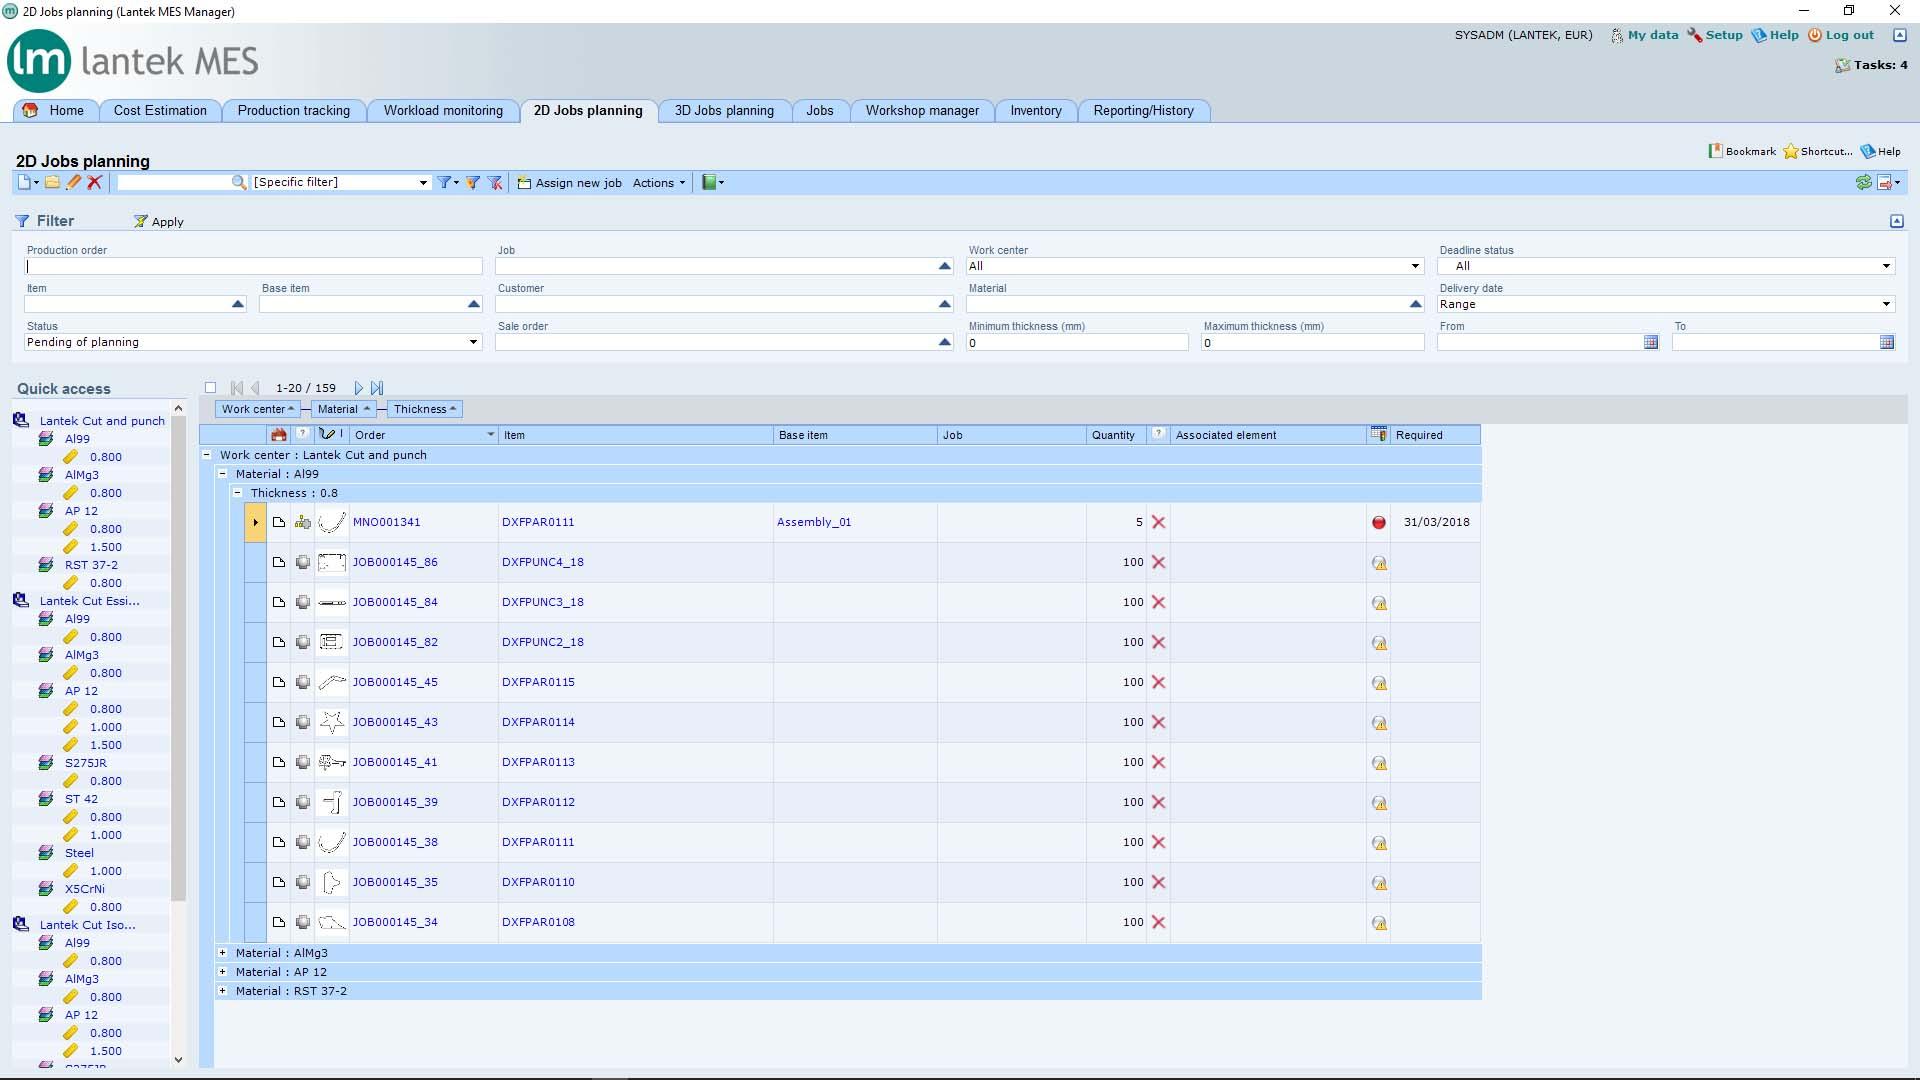 Lantek Manager  - 2D job planning